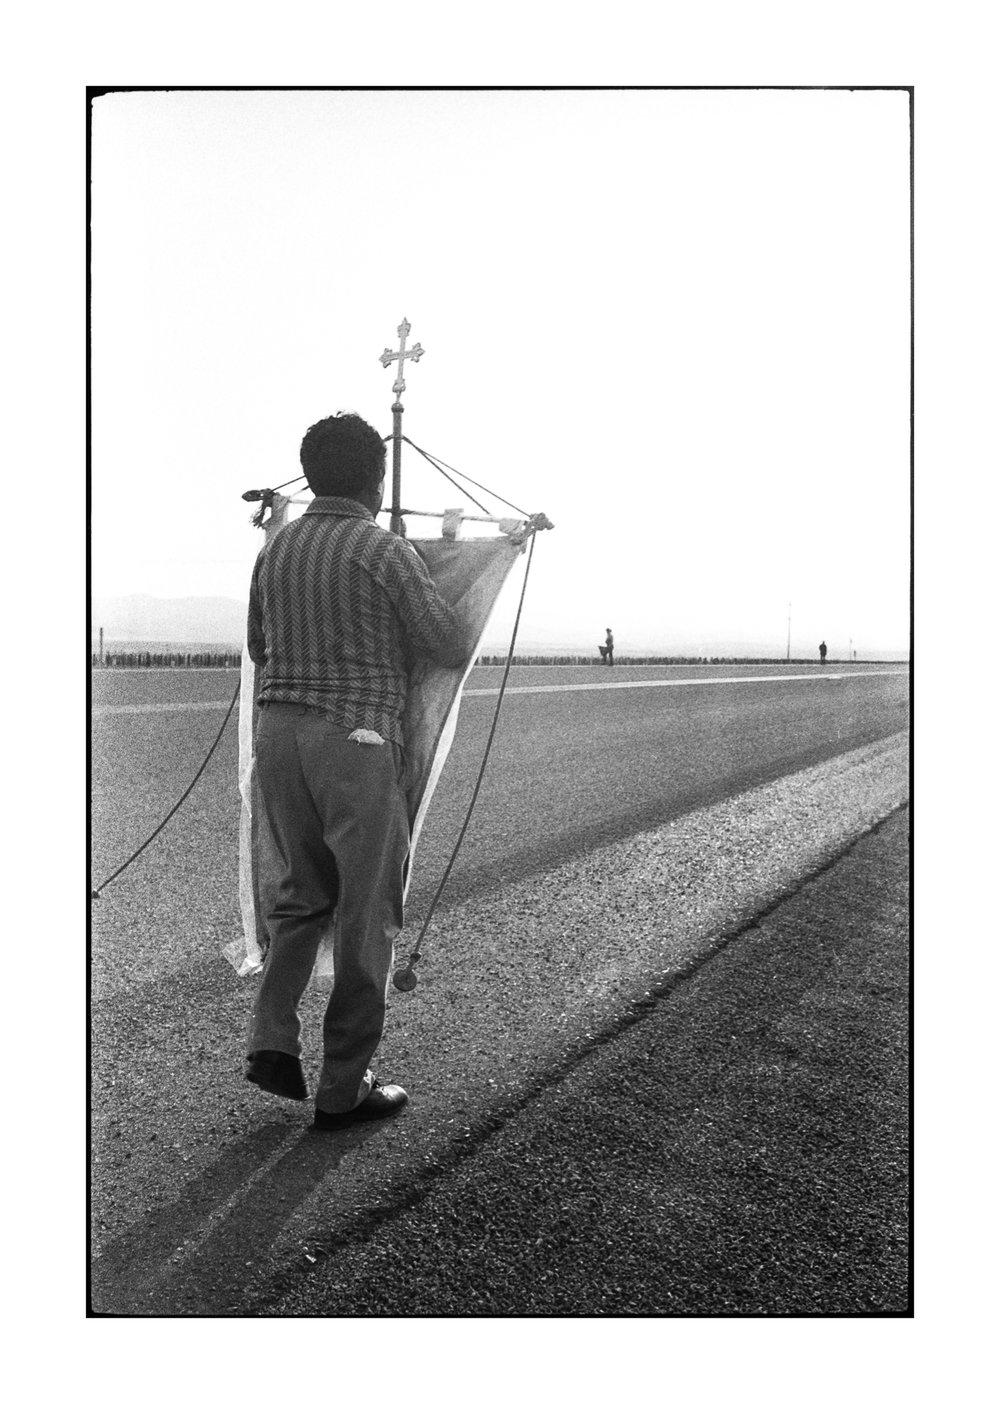 farmworkers-1-71.jpg